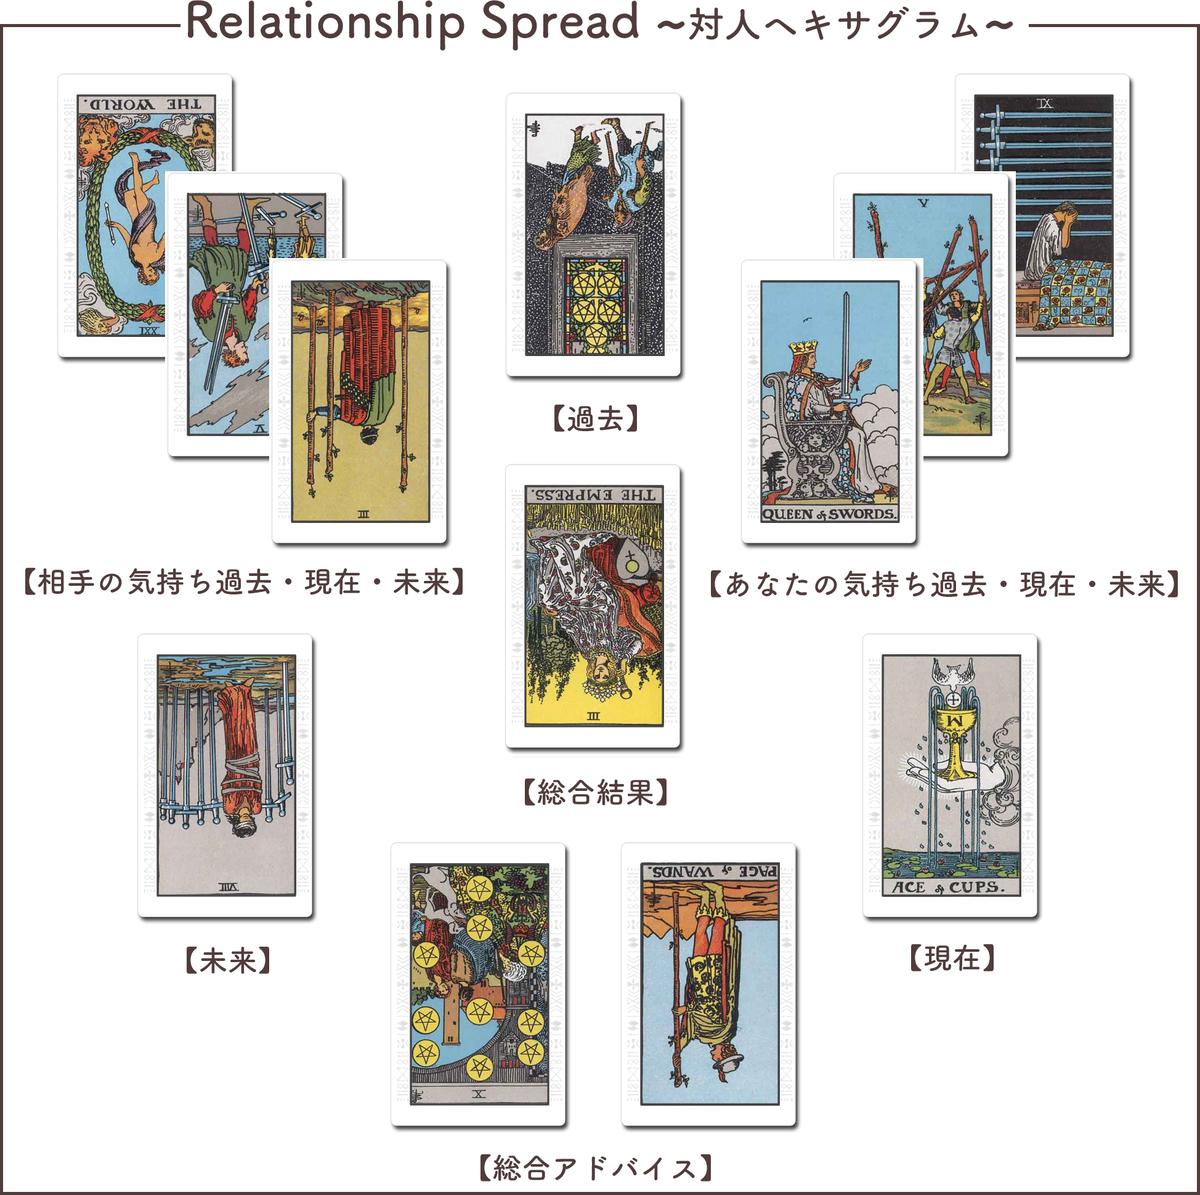 f:id:tarot-sakura:20190522102232j:plain